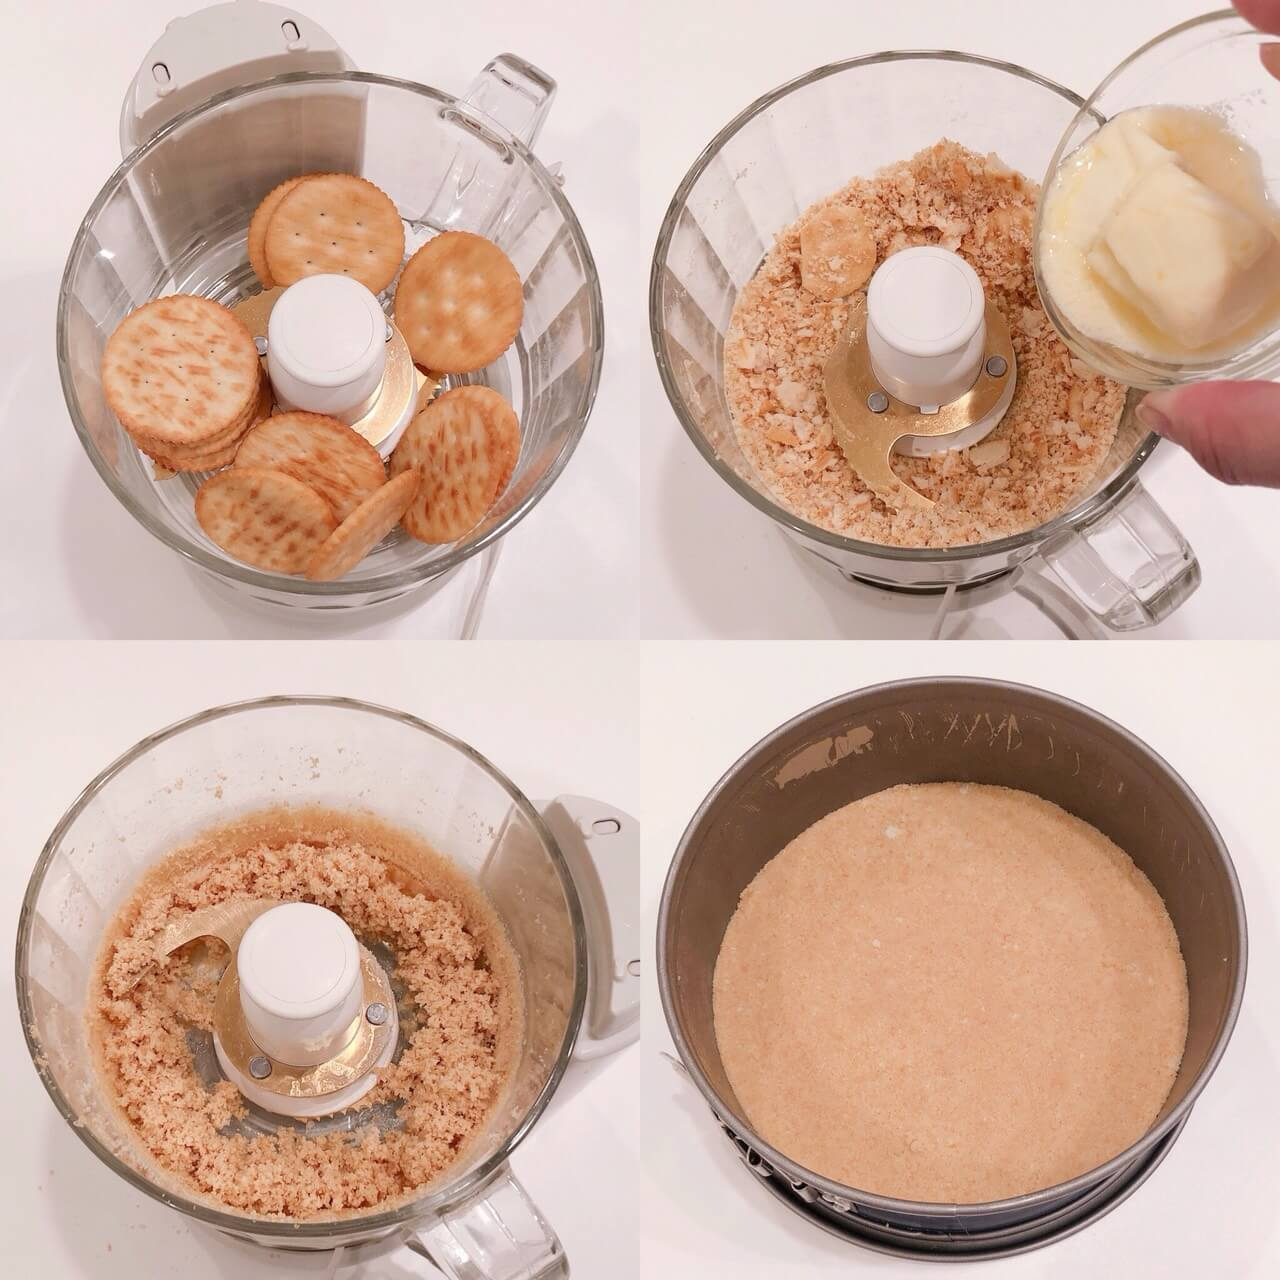 %e3%82%ad%e3%83%86%e3%82%a3-%e3%82%b9%e3%82%a4%e3%83%bc%e3%83%84-%e3%83%ac%e3%82%b7%e3%83%92%e3%82%9a-kitty-sweets-recipe-%e5%87%b1%e8%92%82%e7%8c%ab-%e7%94%9c%e9%bb%9e-%e9%a3%9f%e8%ad%9c2-3-2